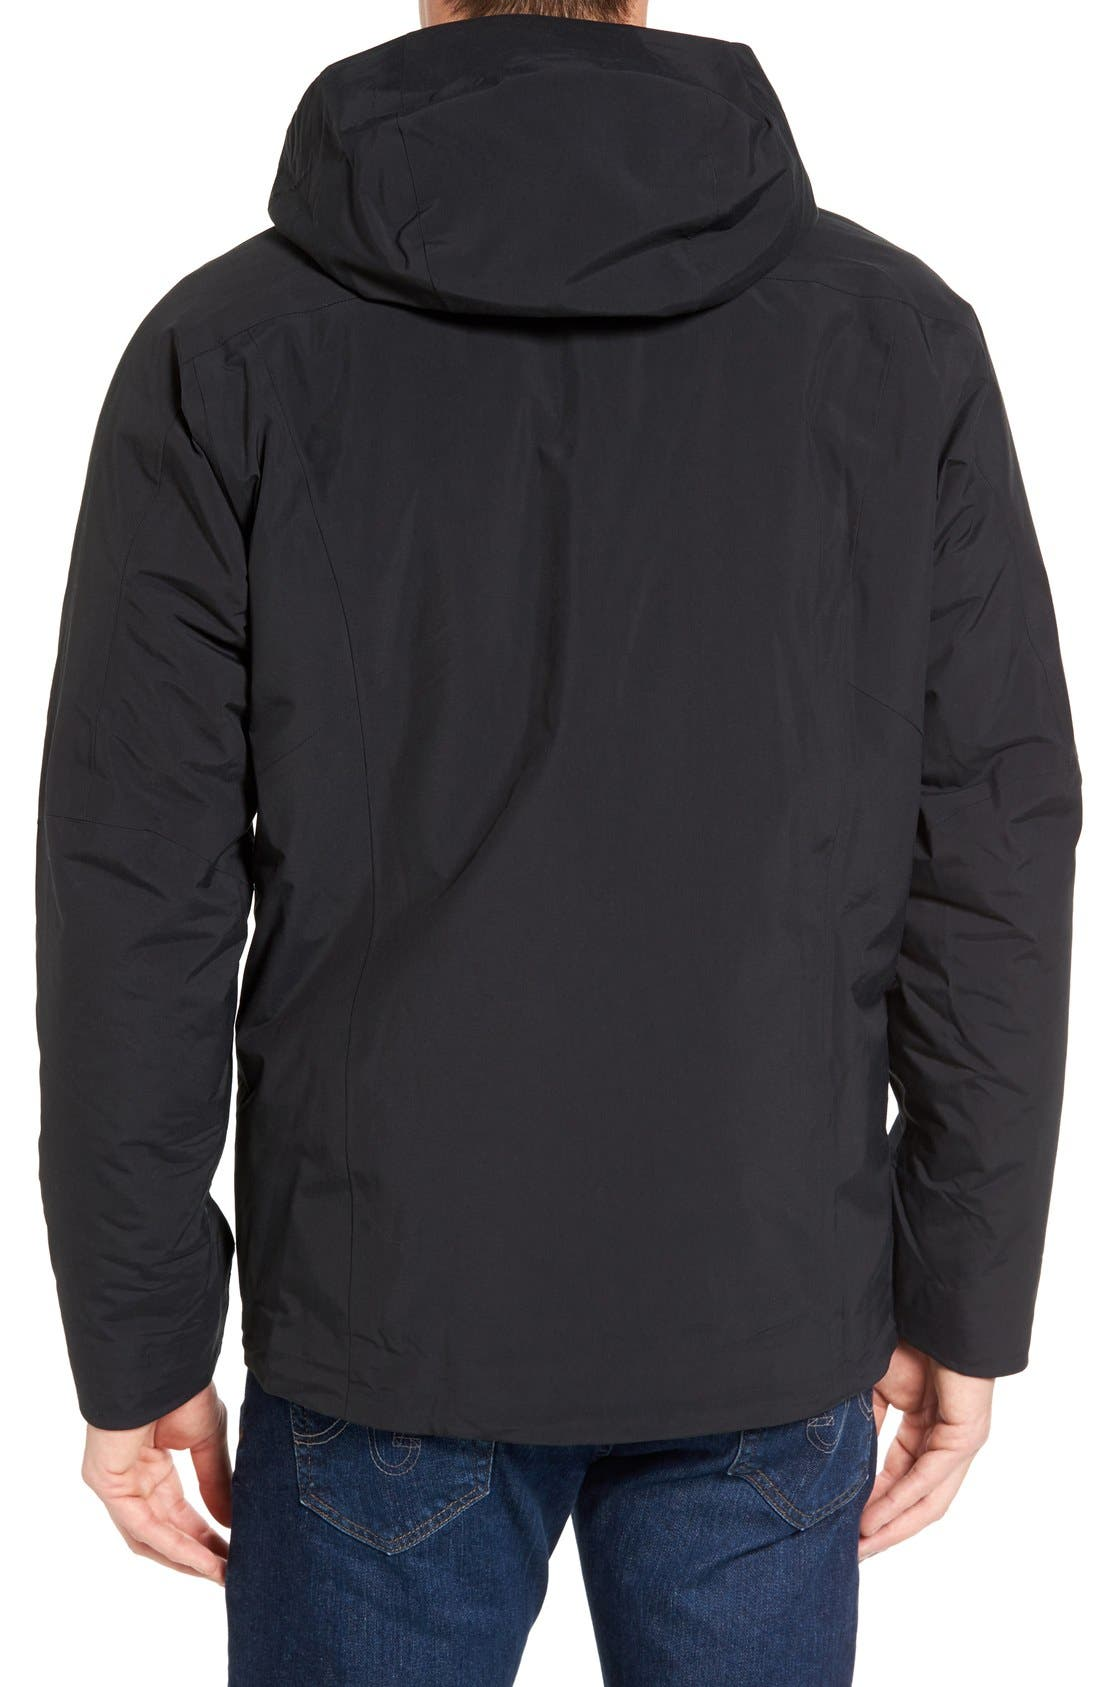 Windsweep 3-in-1 Jacket,                             Alternate thumbnail 2, color,                             Black